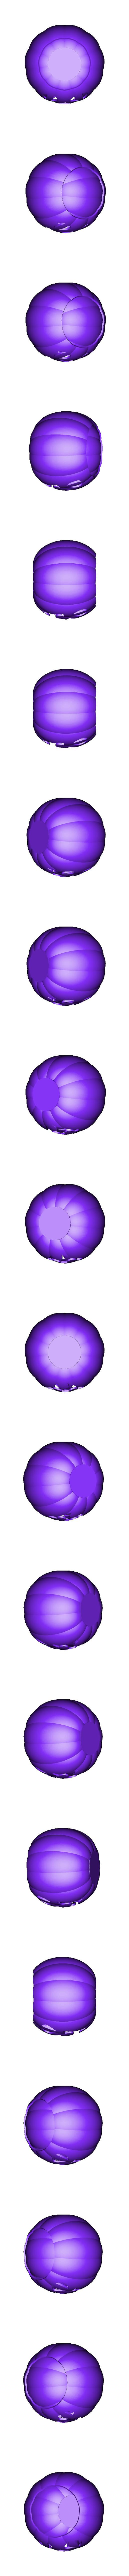 Jack-O-Lantern Base Funny Face.stl Télécharger fichier STL Visage drôle de la lanterne Jack-O'-Lanterne • Objet imprimable en 3D, abbymath